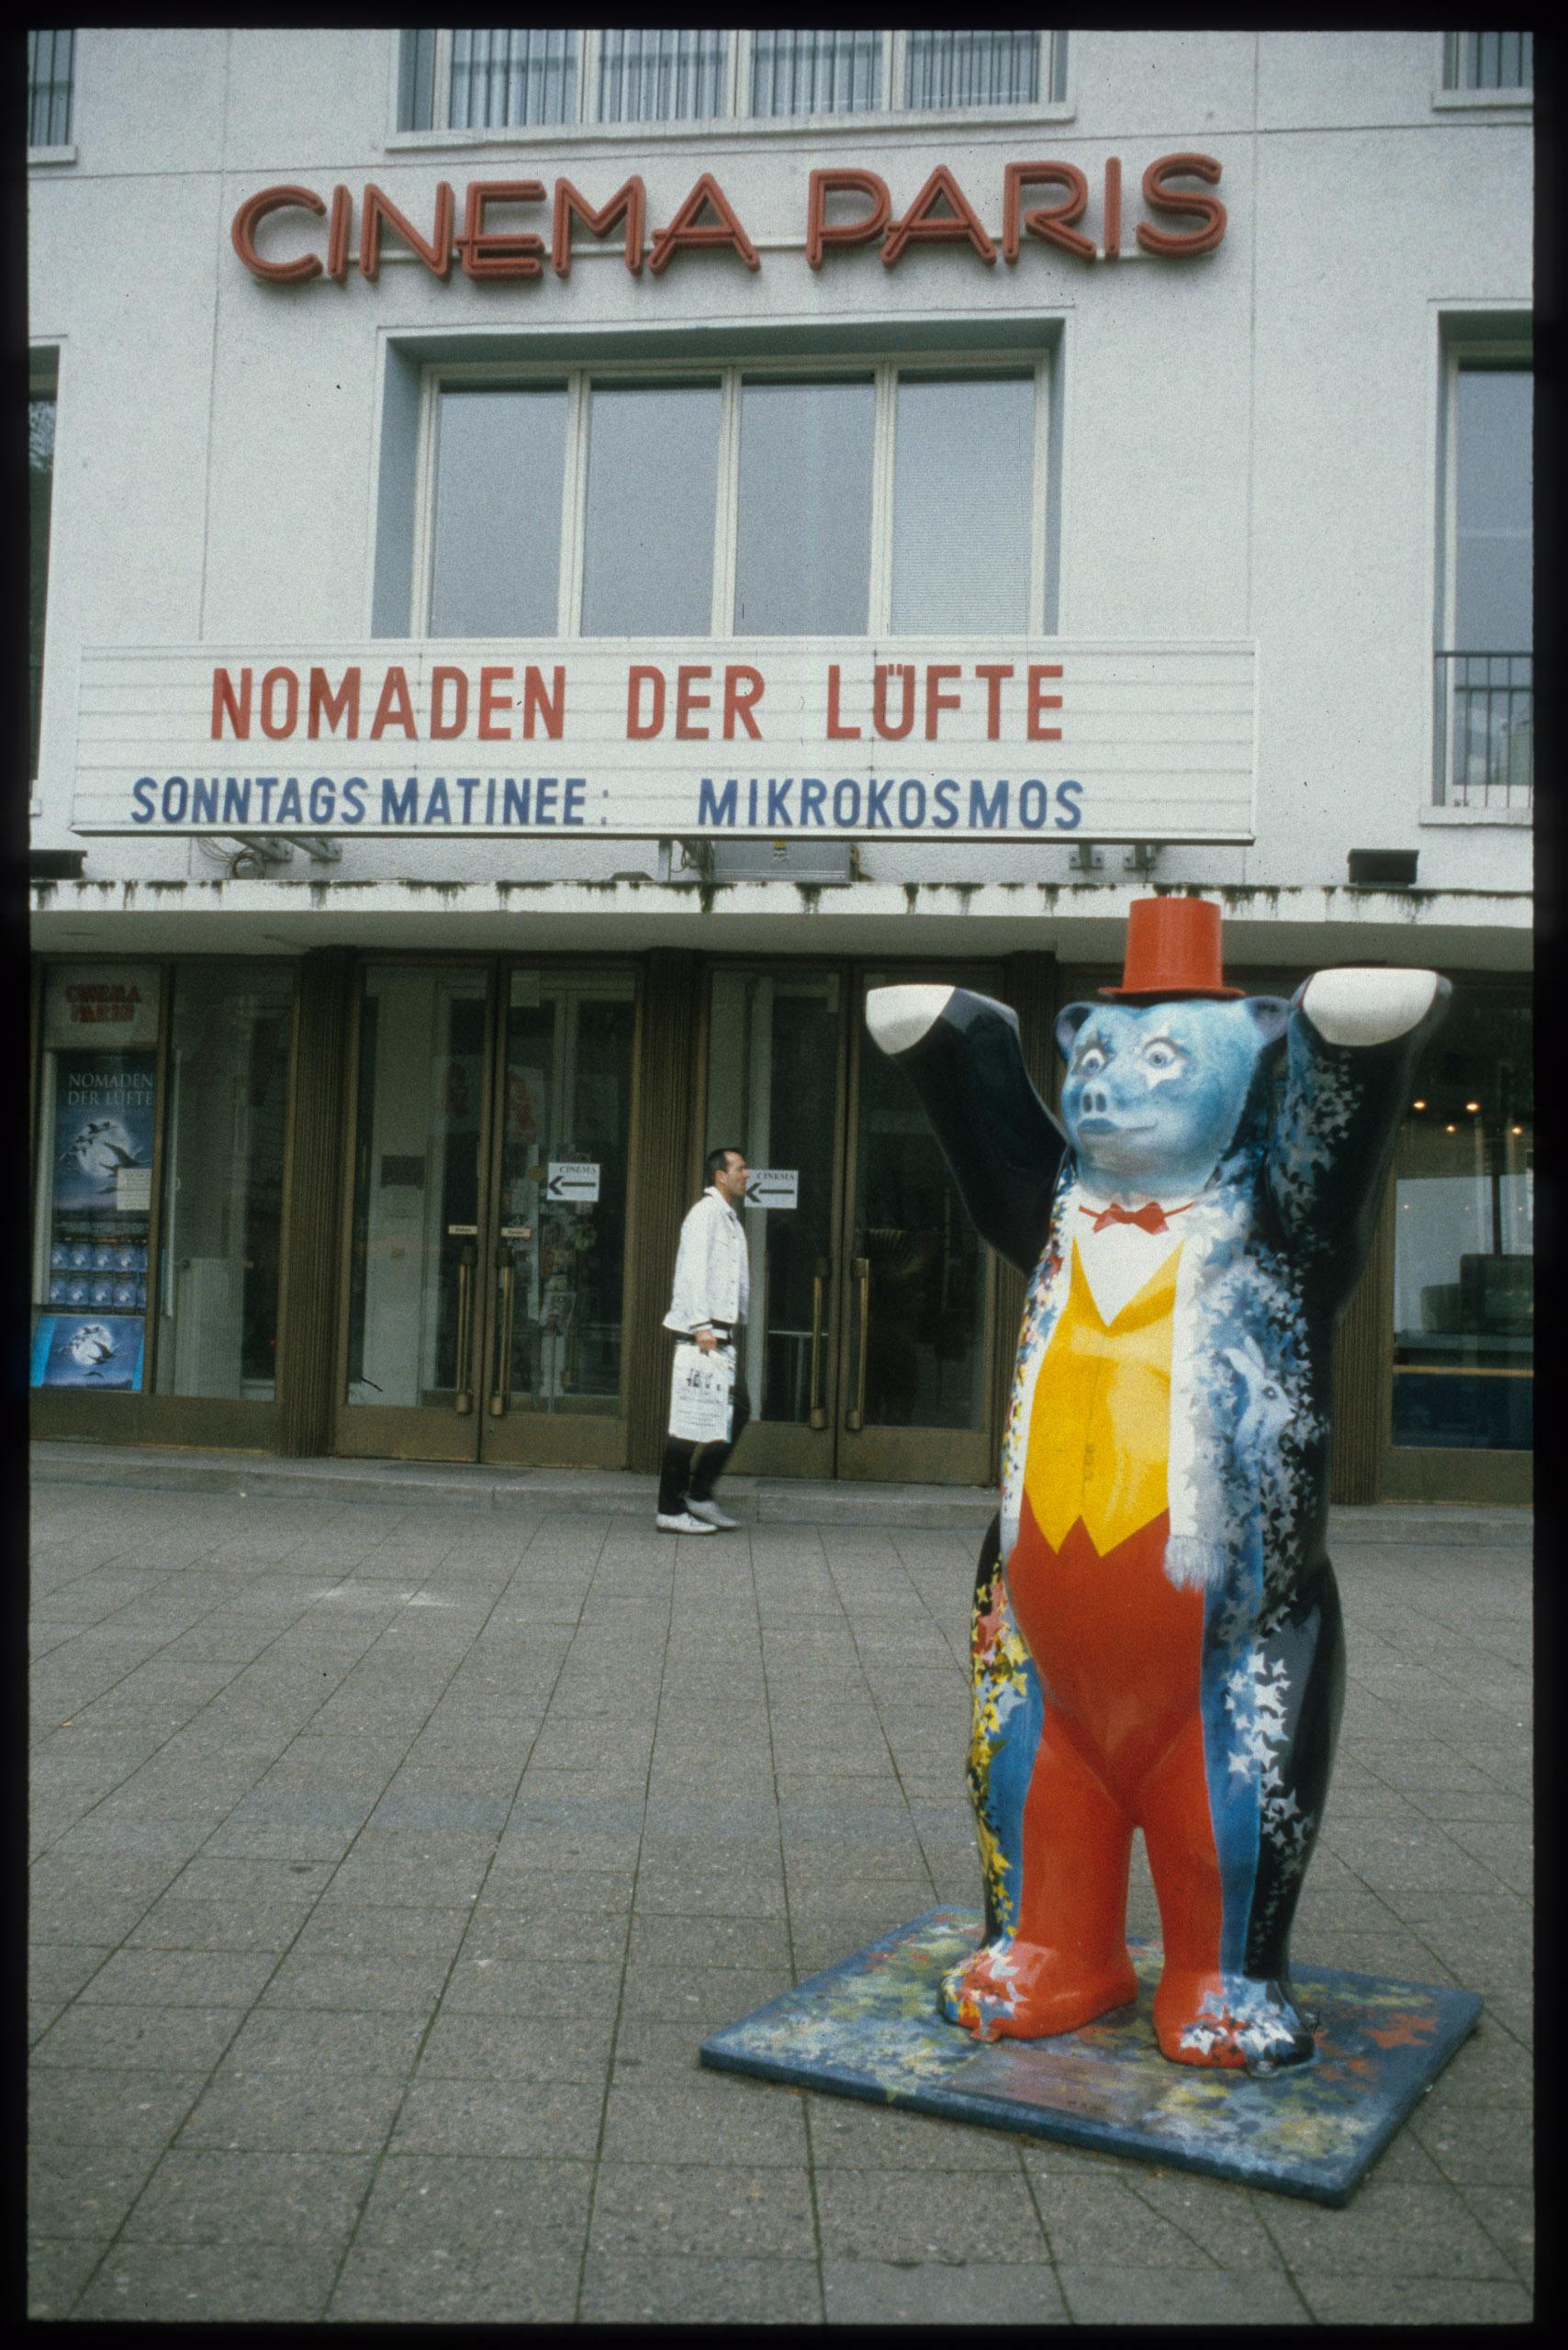 Farbfoto: Kinoeingang mit bemaltem Berlinbär